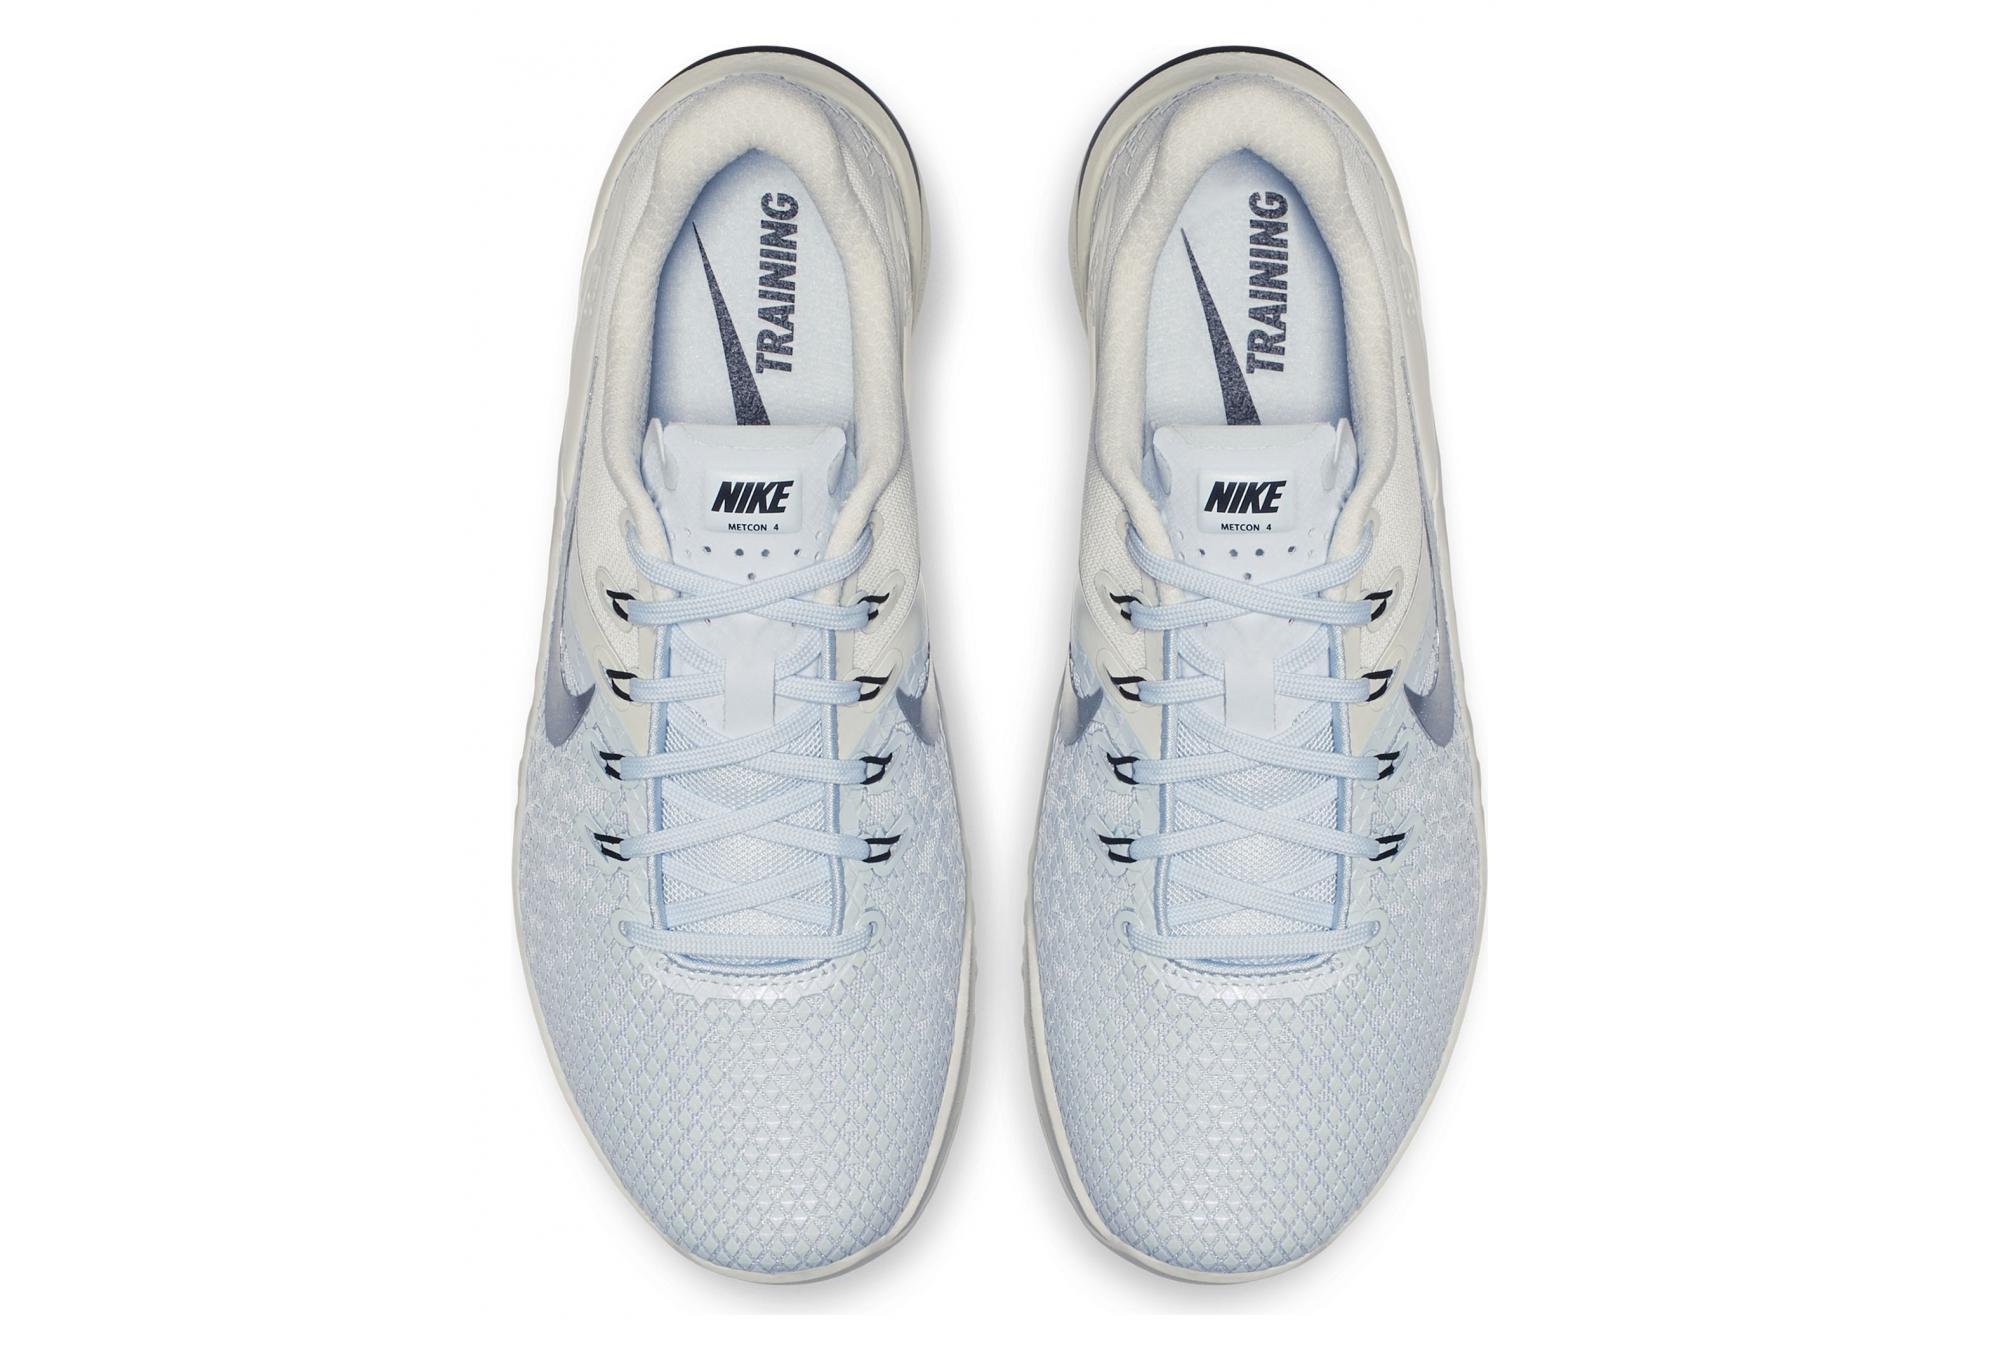 promo code 455ad a99a2 Chaussures de Cross Training Femme Nike Metcon 4 XD Bleu   Blanc